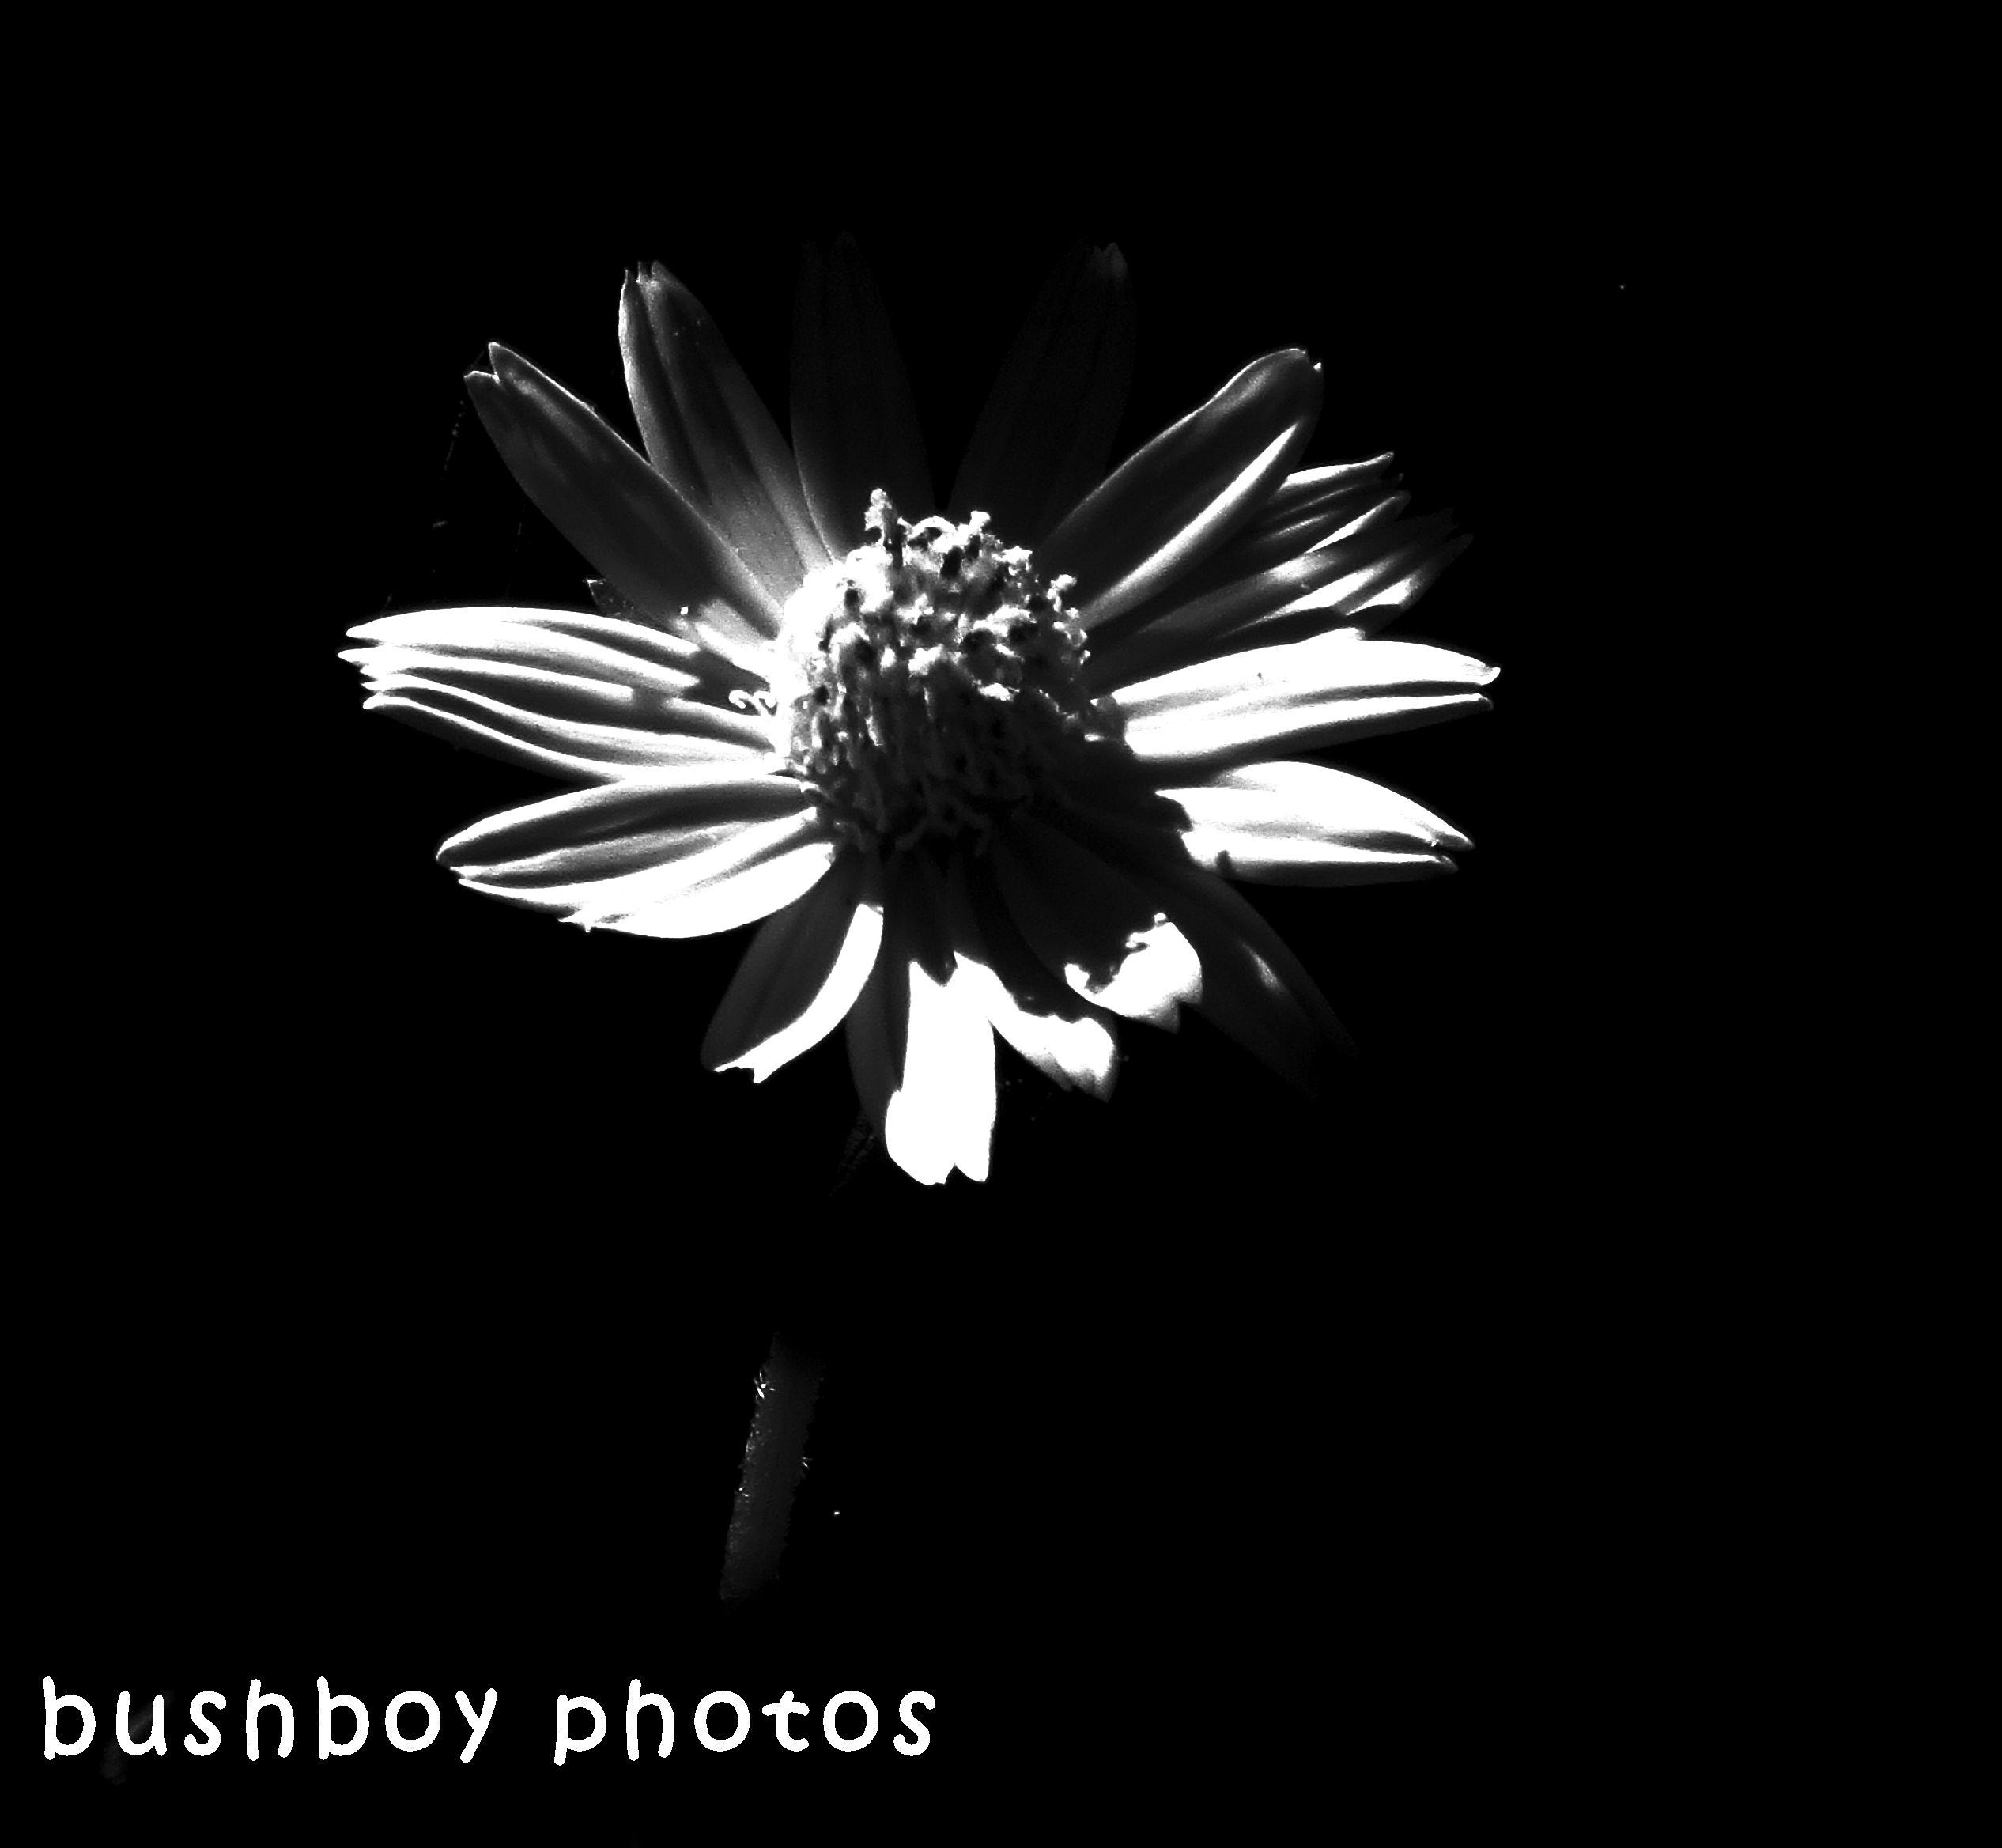 180530_blackand white_flowers_singapore daisy